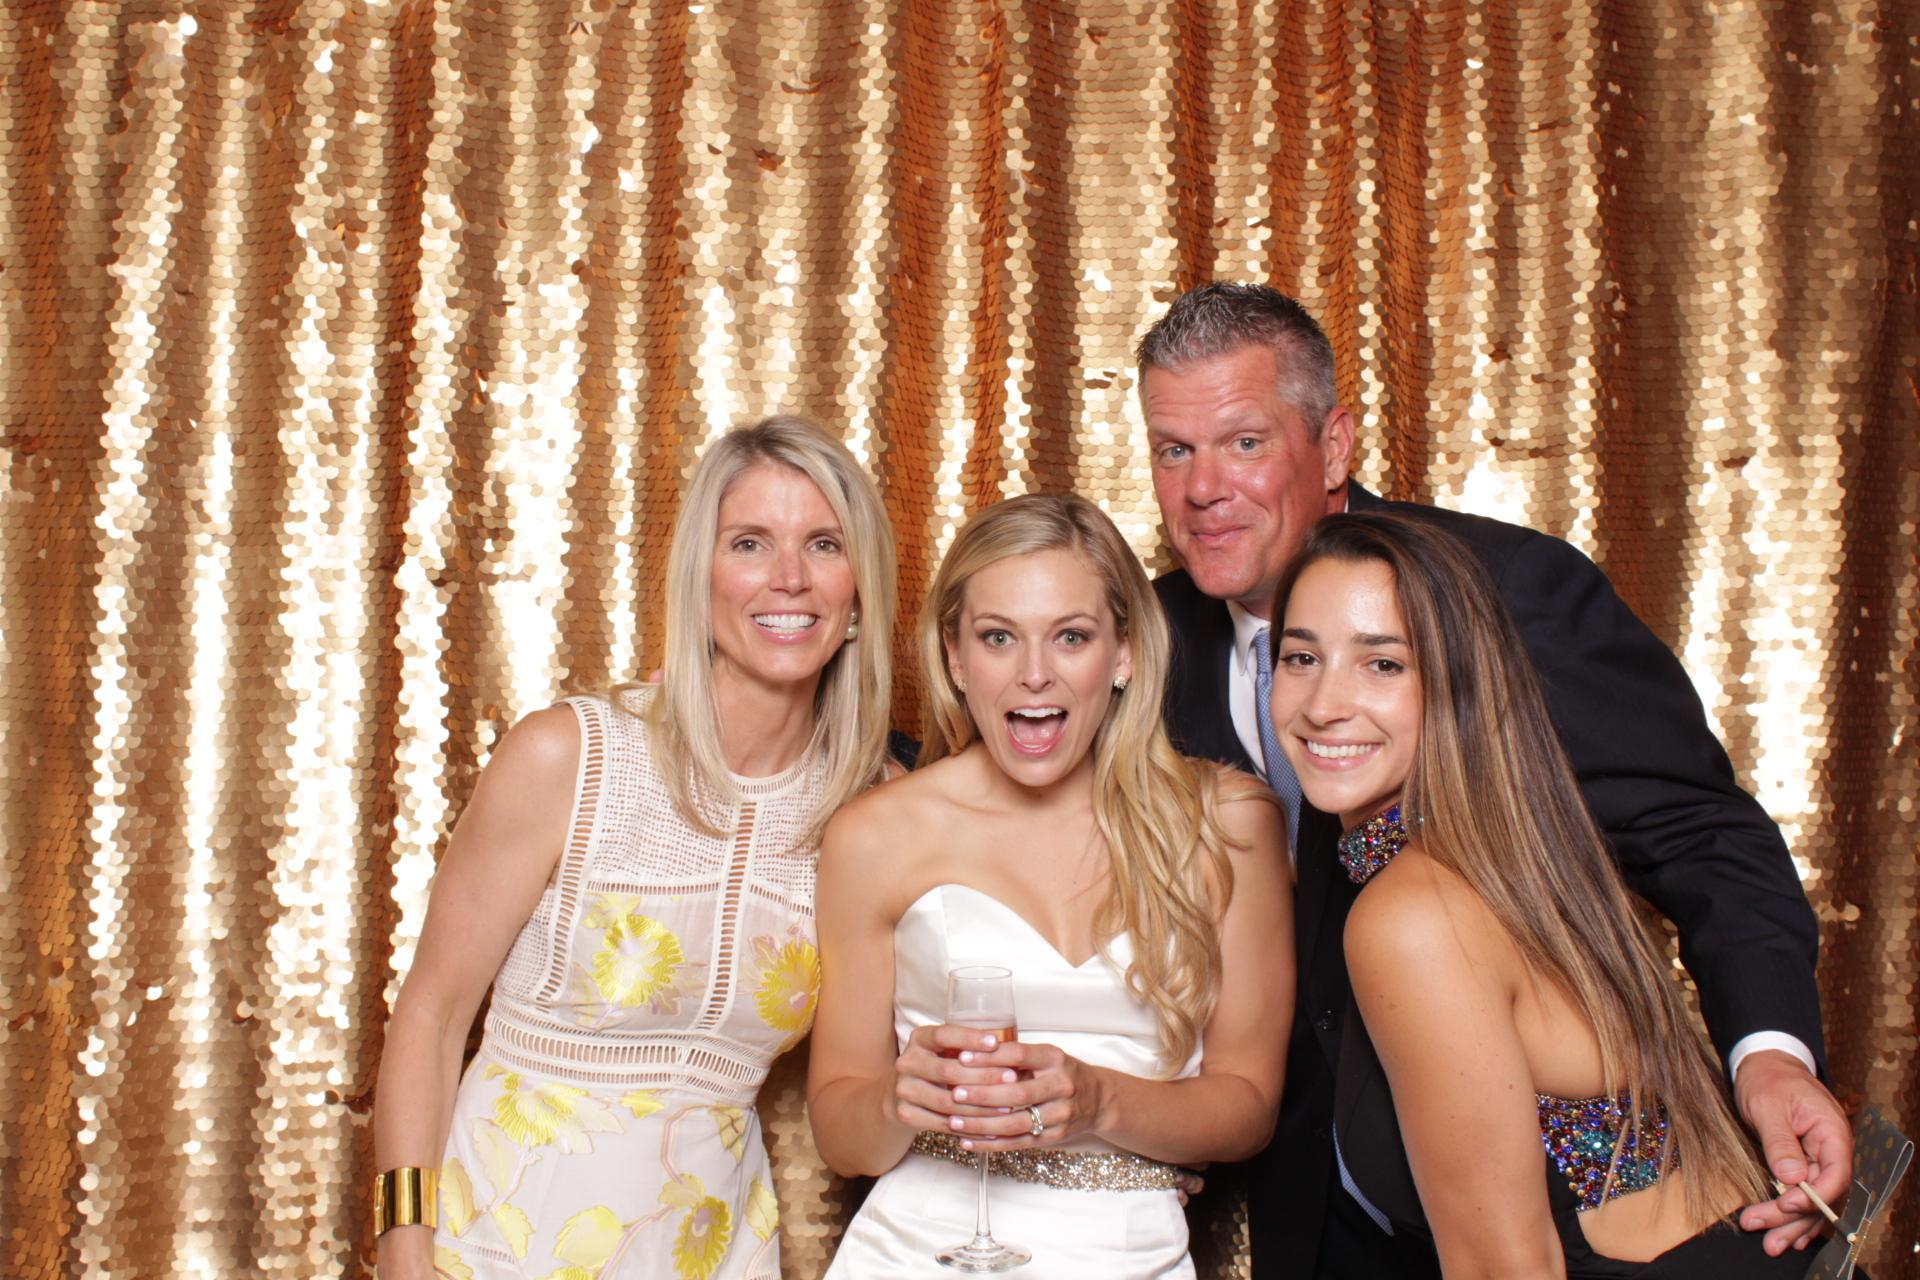 Minneapolis_wedding_photo_booth_Machine_Shop (19).jpg